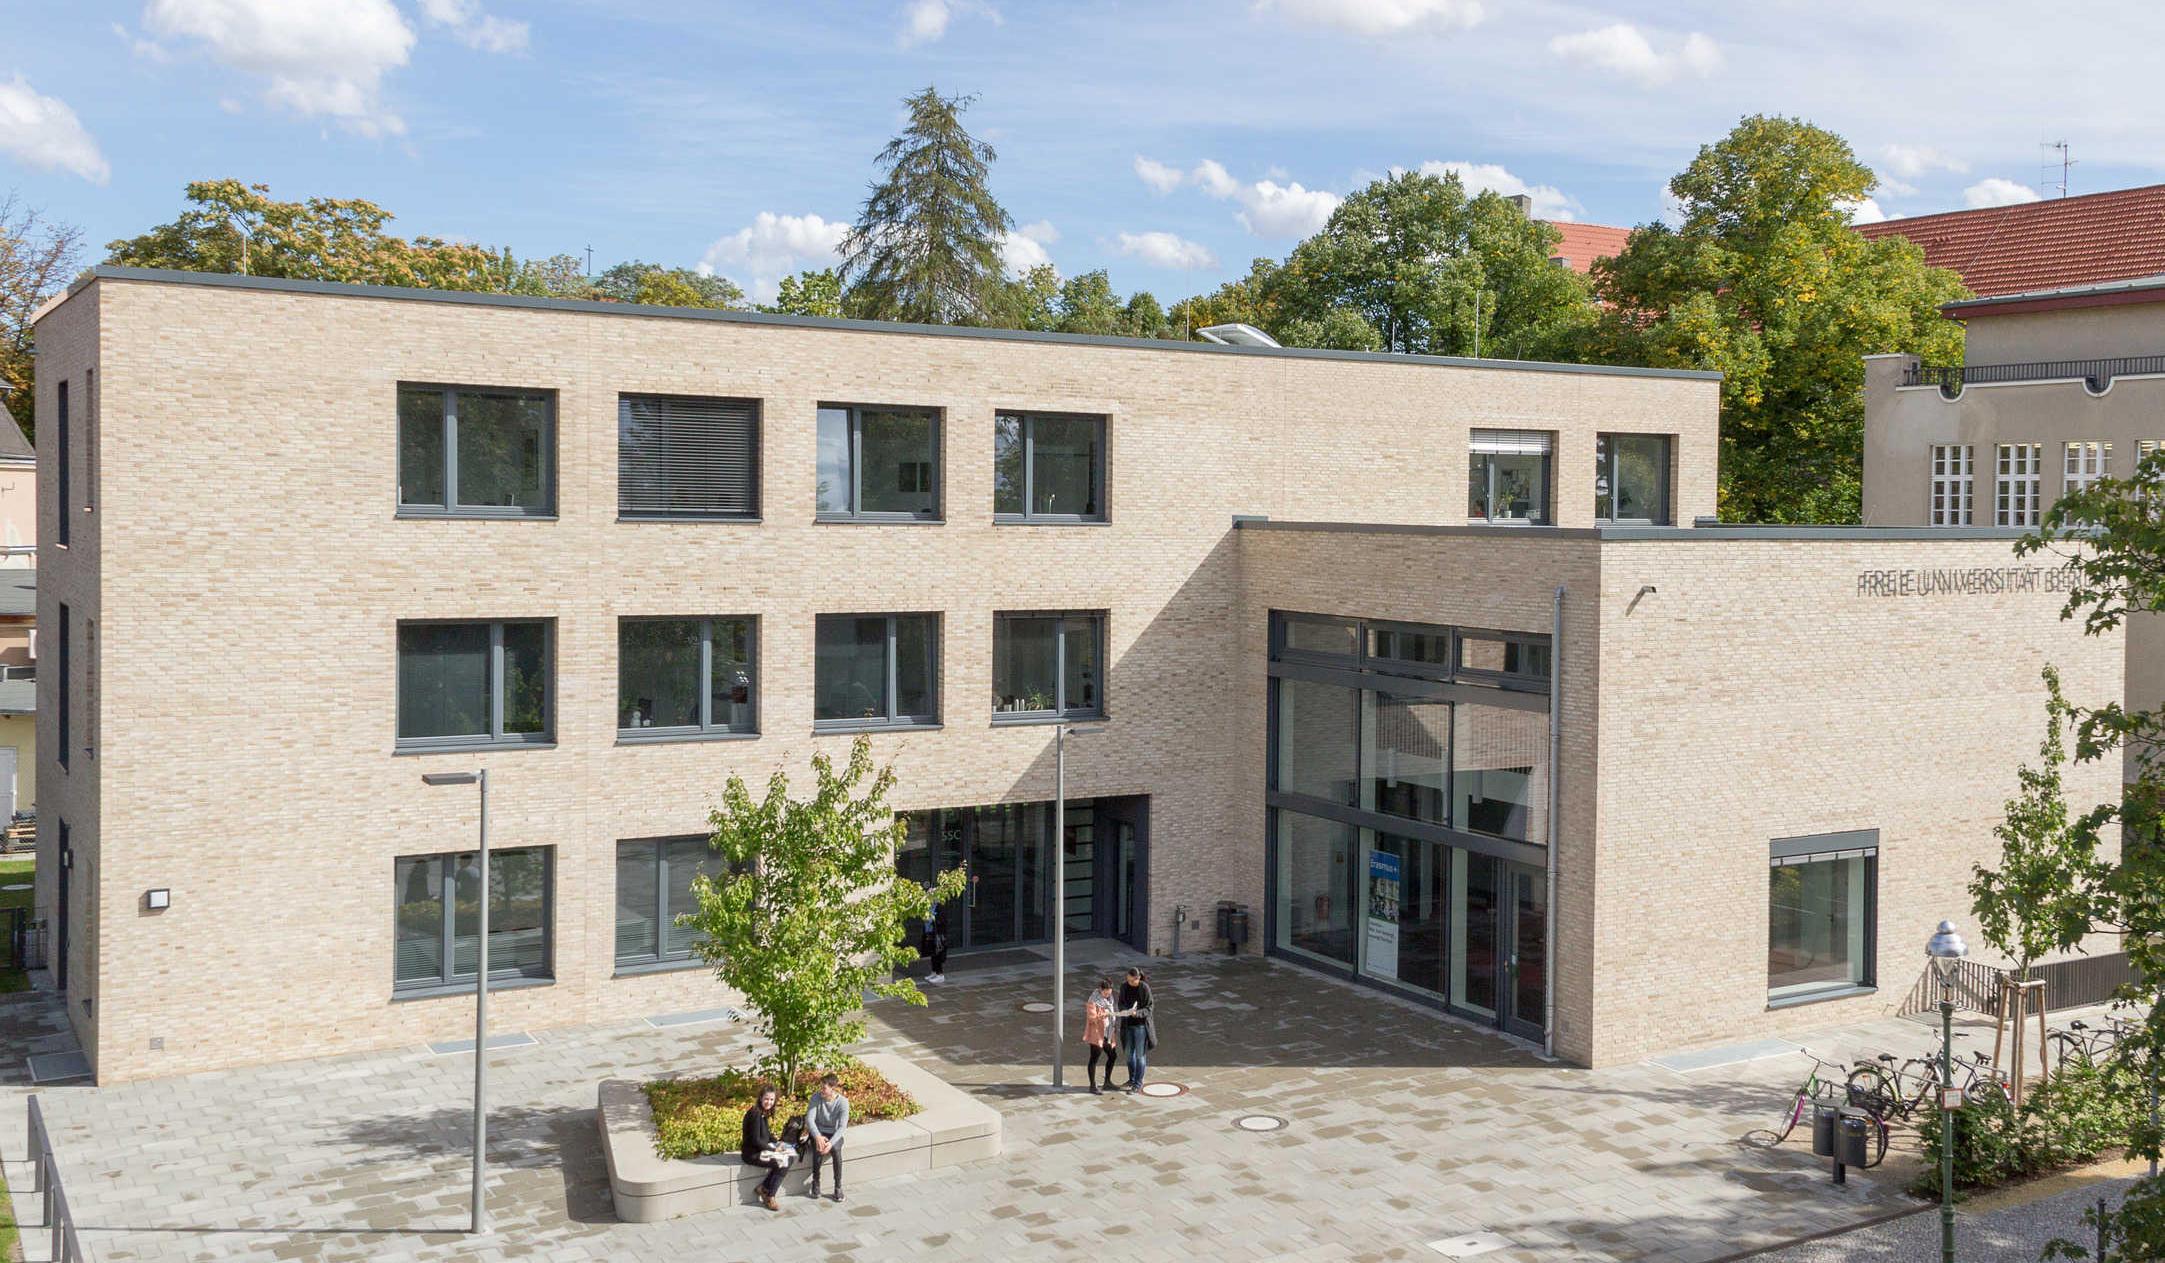 Studierenden-Service-Center (SSC) • Studium • Freie Universität Berlin